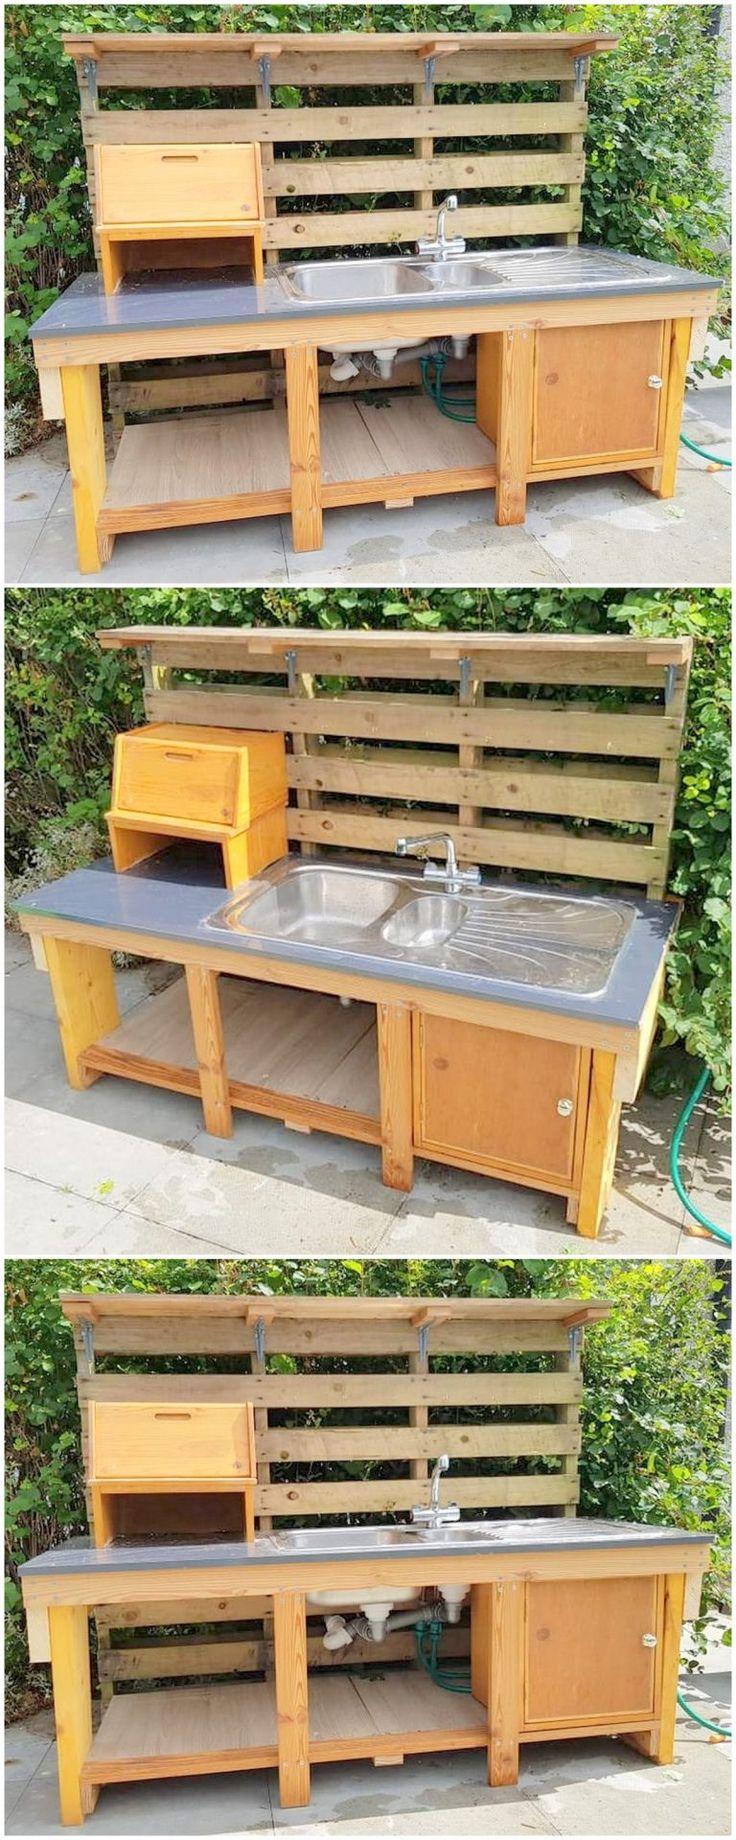 DIY Ecstatic Home Refurbishing mit Holzpaletten